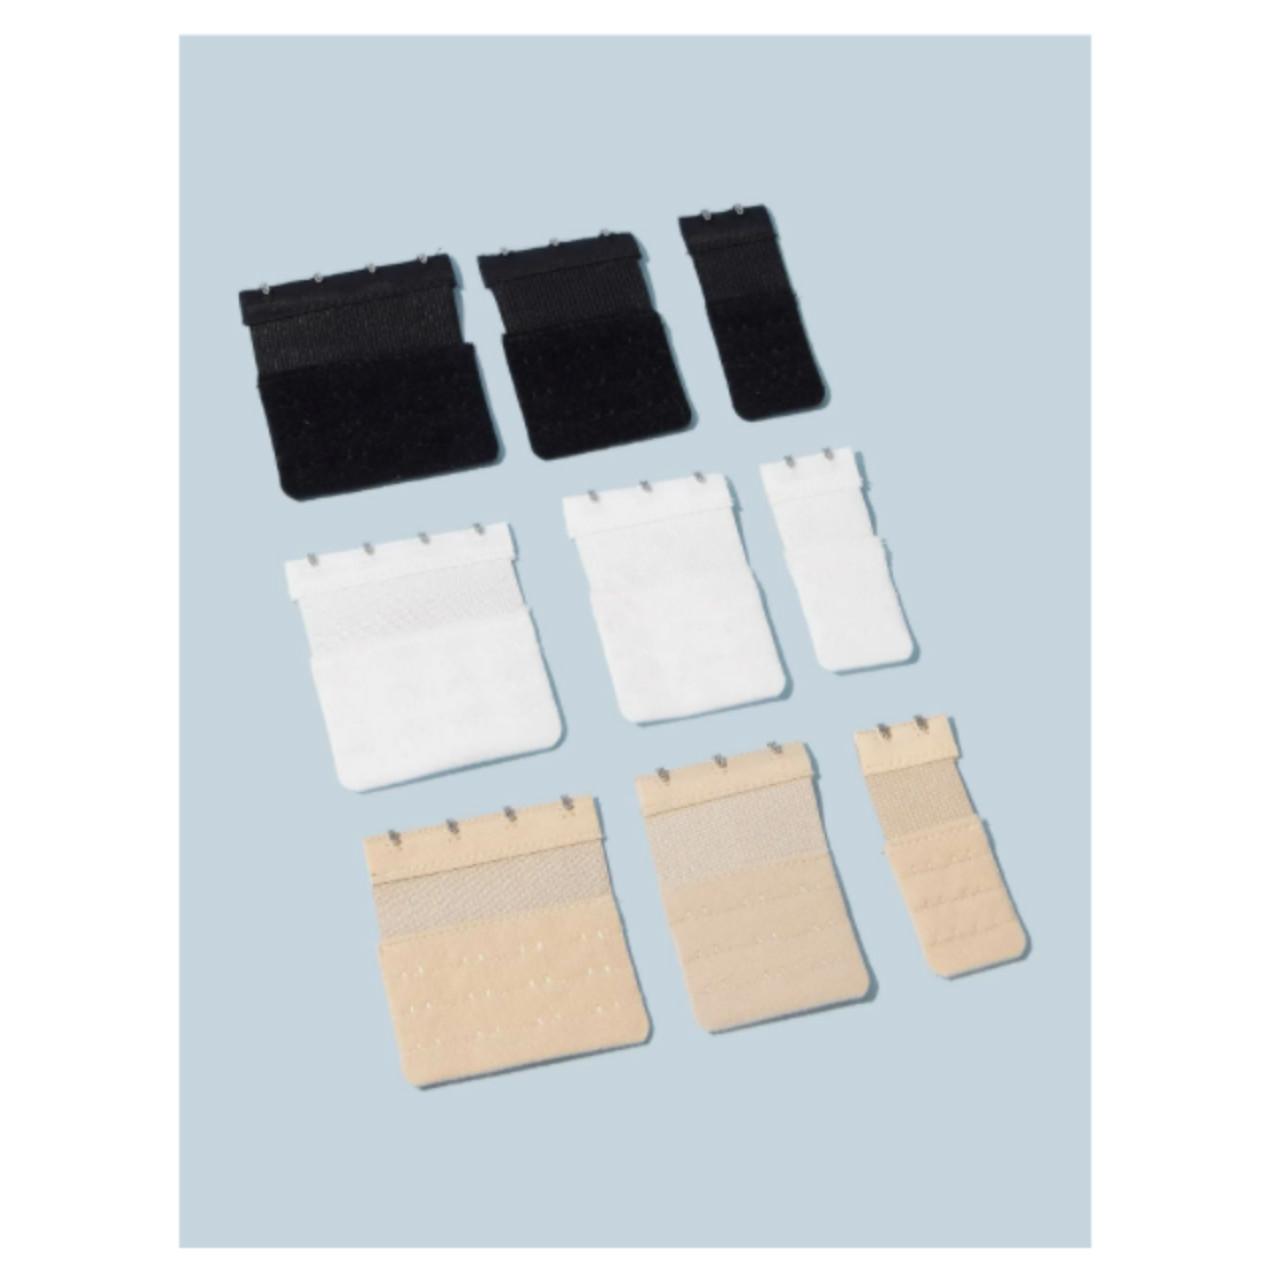 9pack plus bra extender hook strap one-size